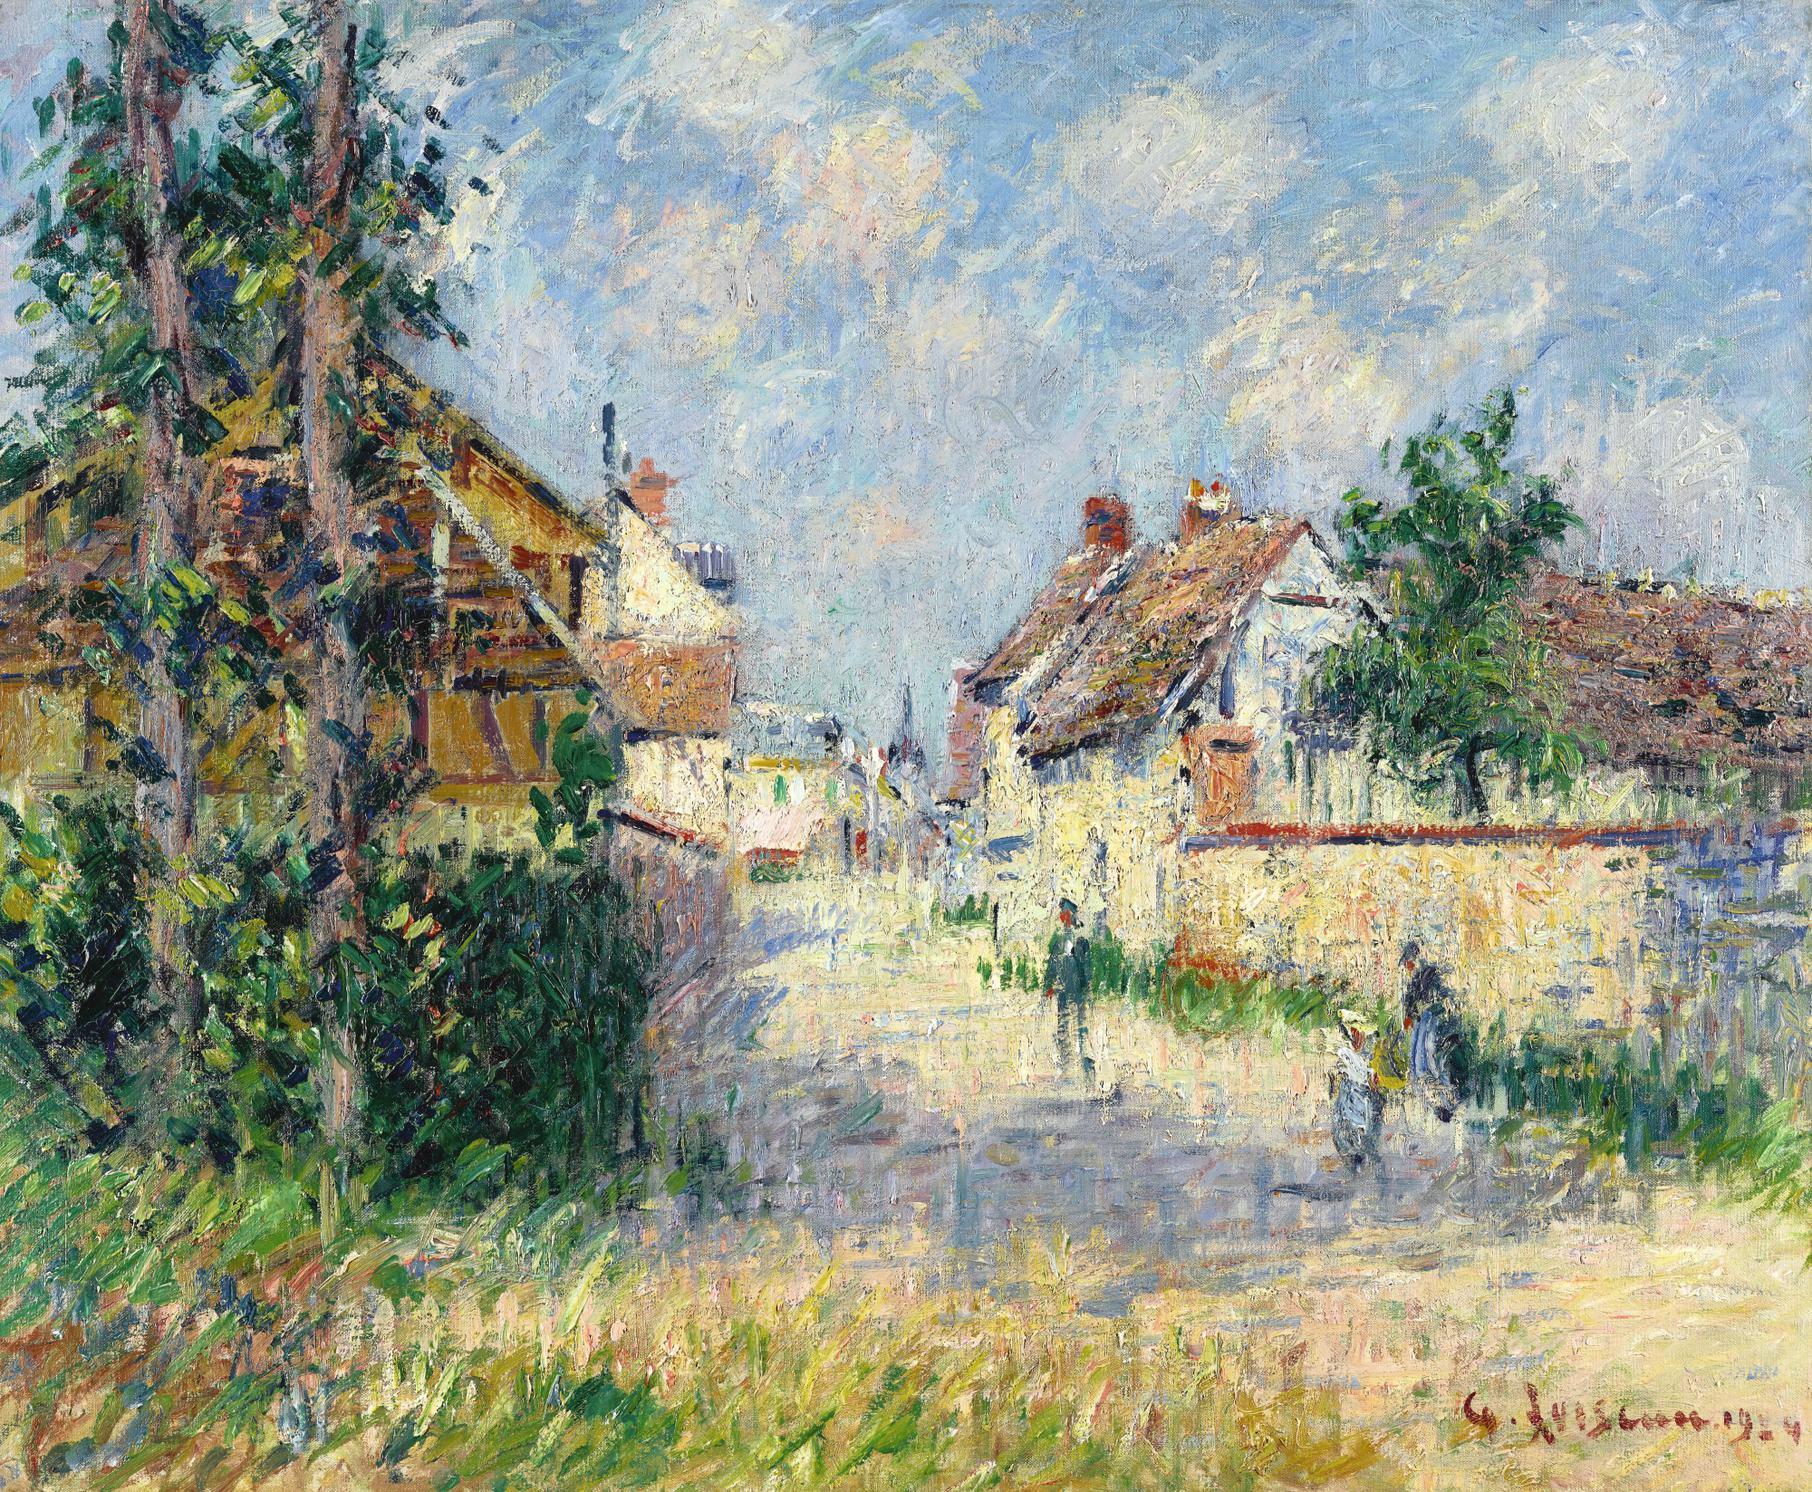 Gustave Loiseau-Rue A Saint-Cyr-Du-Vaudreuil-1924